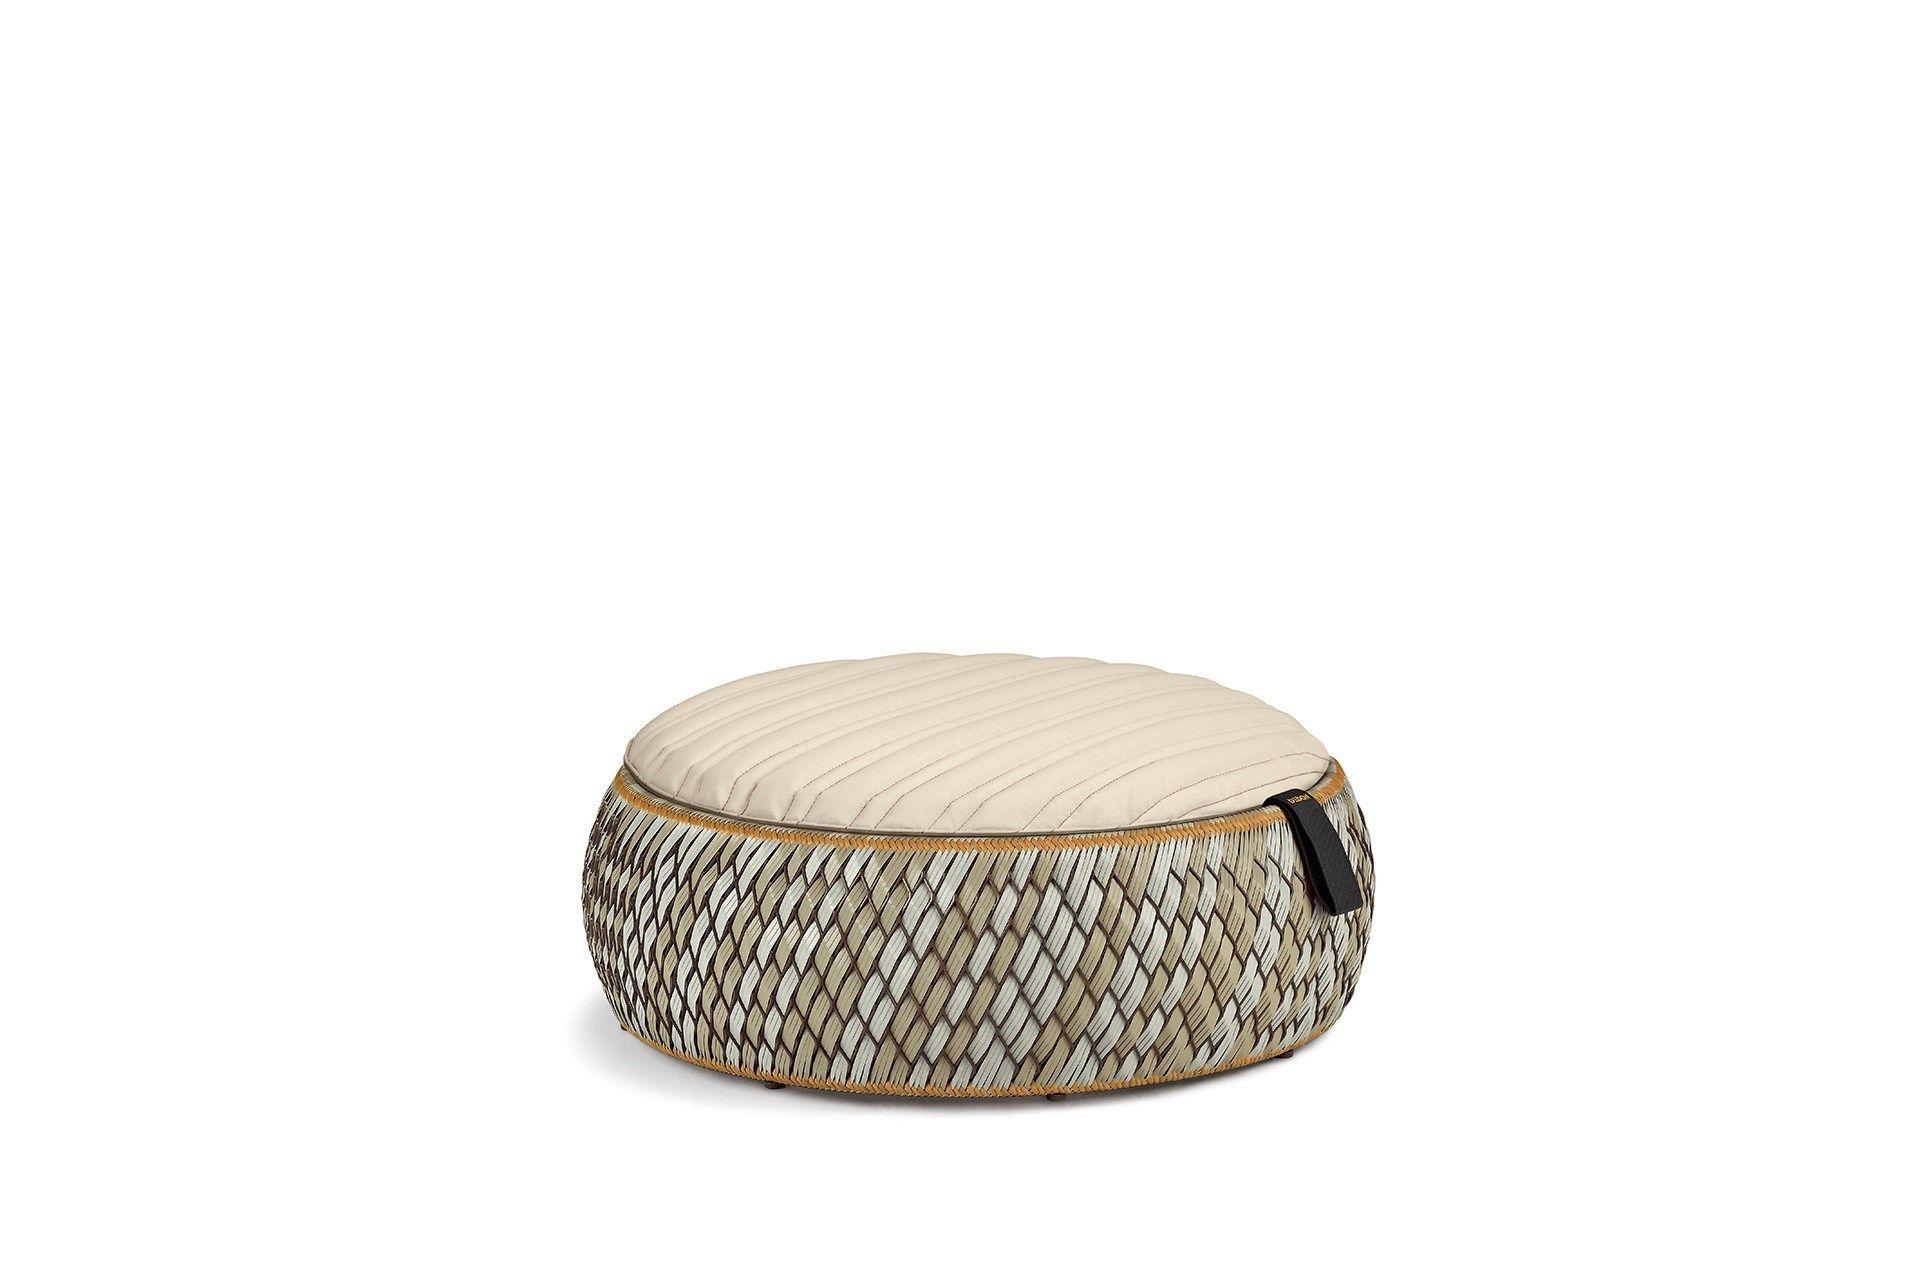 Tavolino Poggiapiedi ~ Dala poggiapiedi da giardino by dedon furniture pinterest